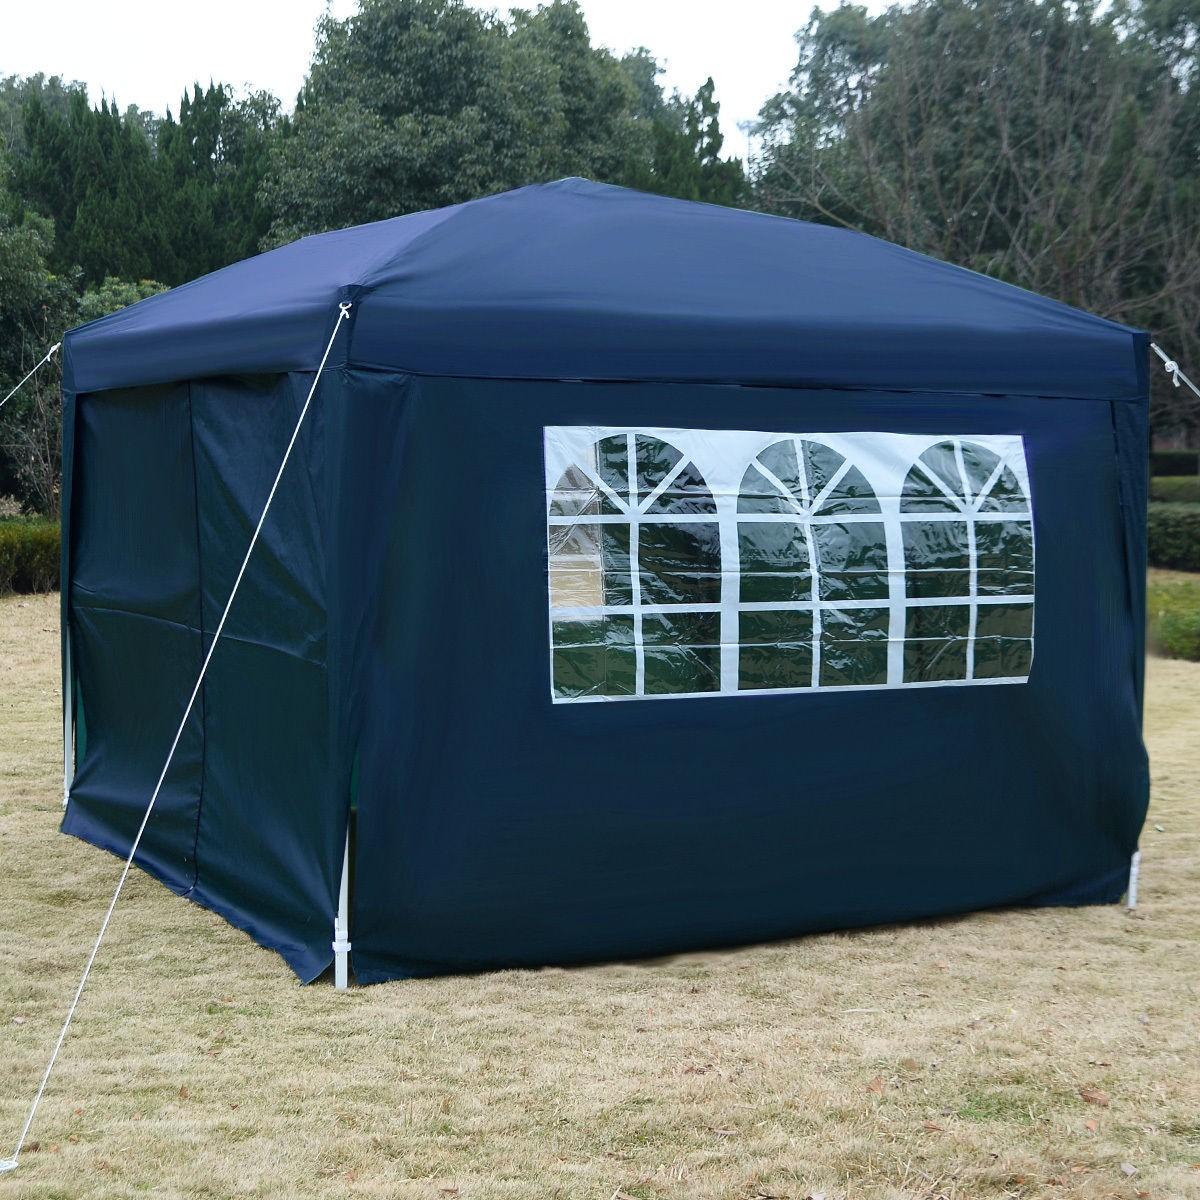 Green Color Canopies : Ez pop up tent canopy gazebo